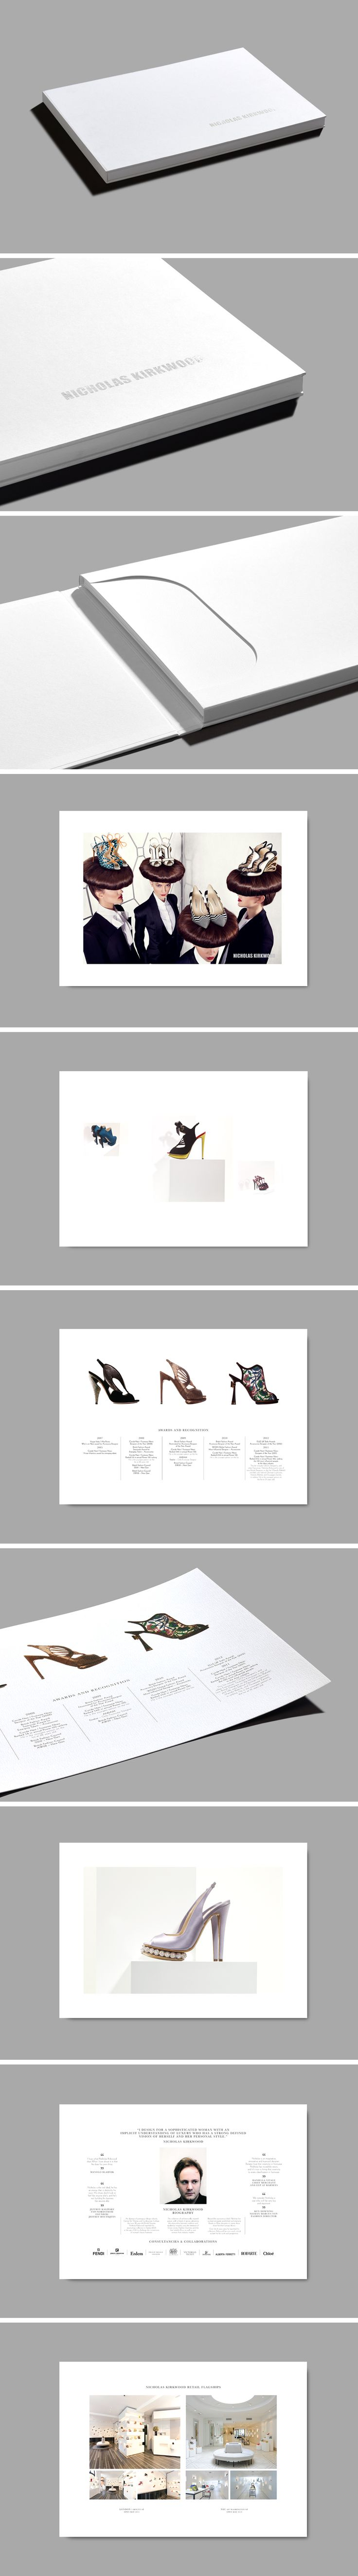 Format – Bespoke Book Custom Inserts  Client – Nicholas Kirkwood